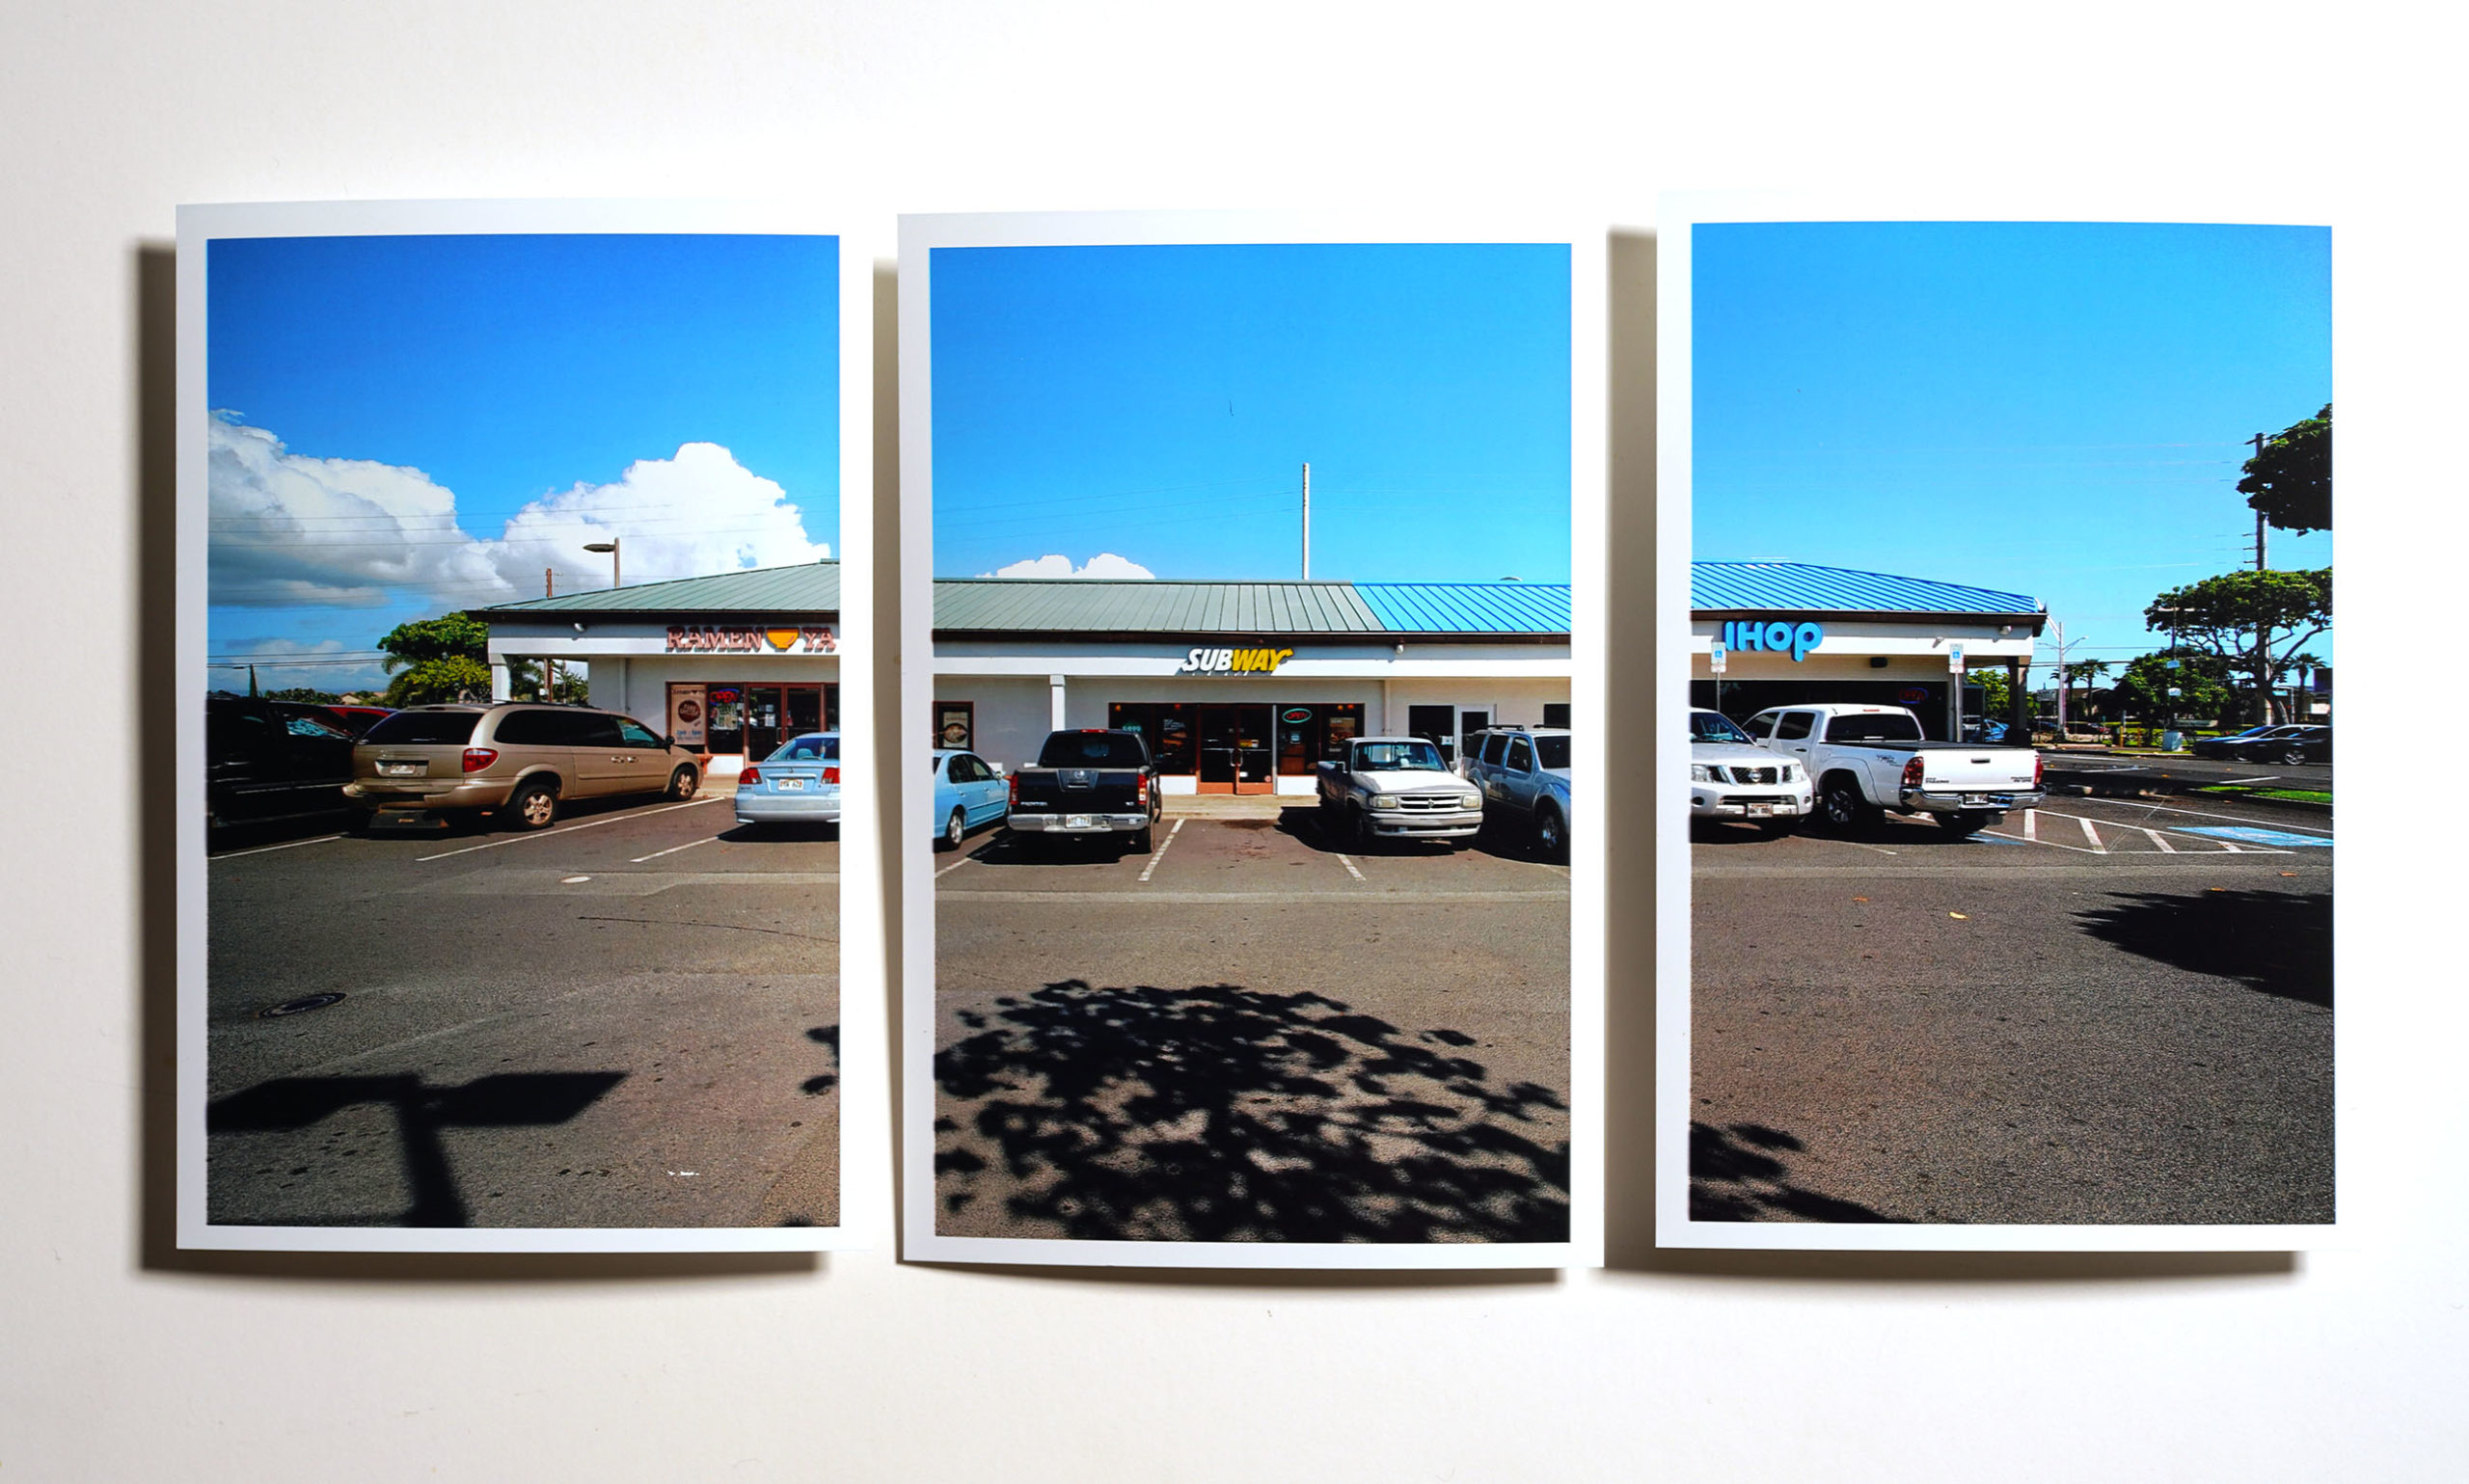 Sefo Fatai Ewa Beach Subway parking lot.